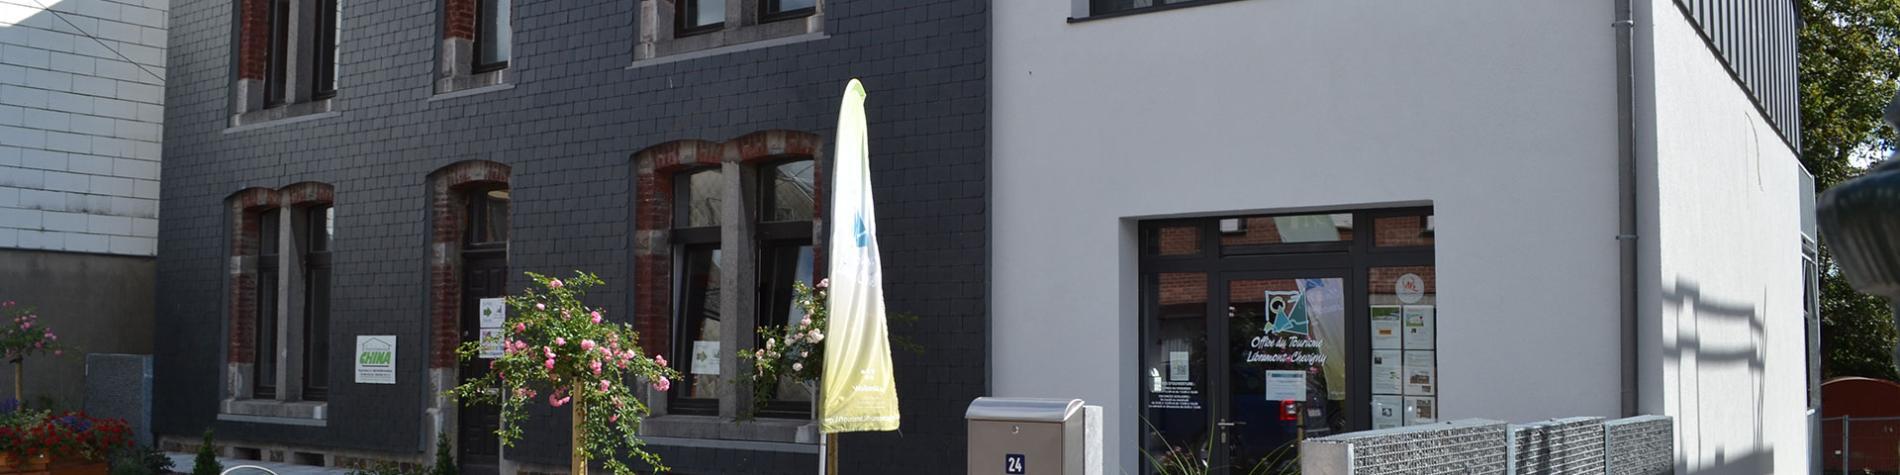 Office communal - Tourisme - Libramont-Chevigny